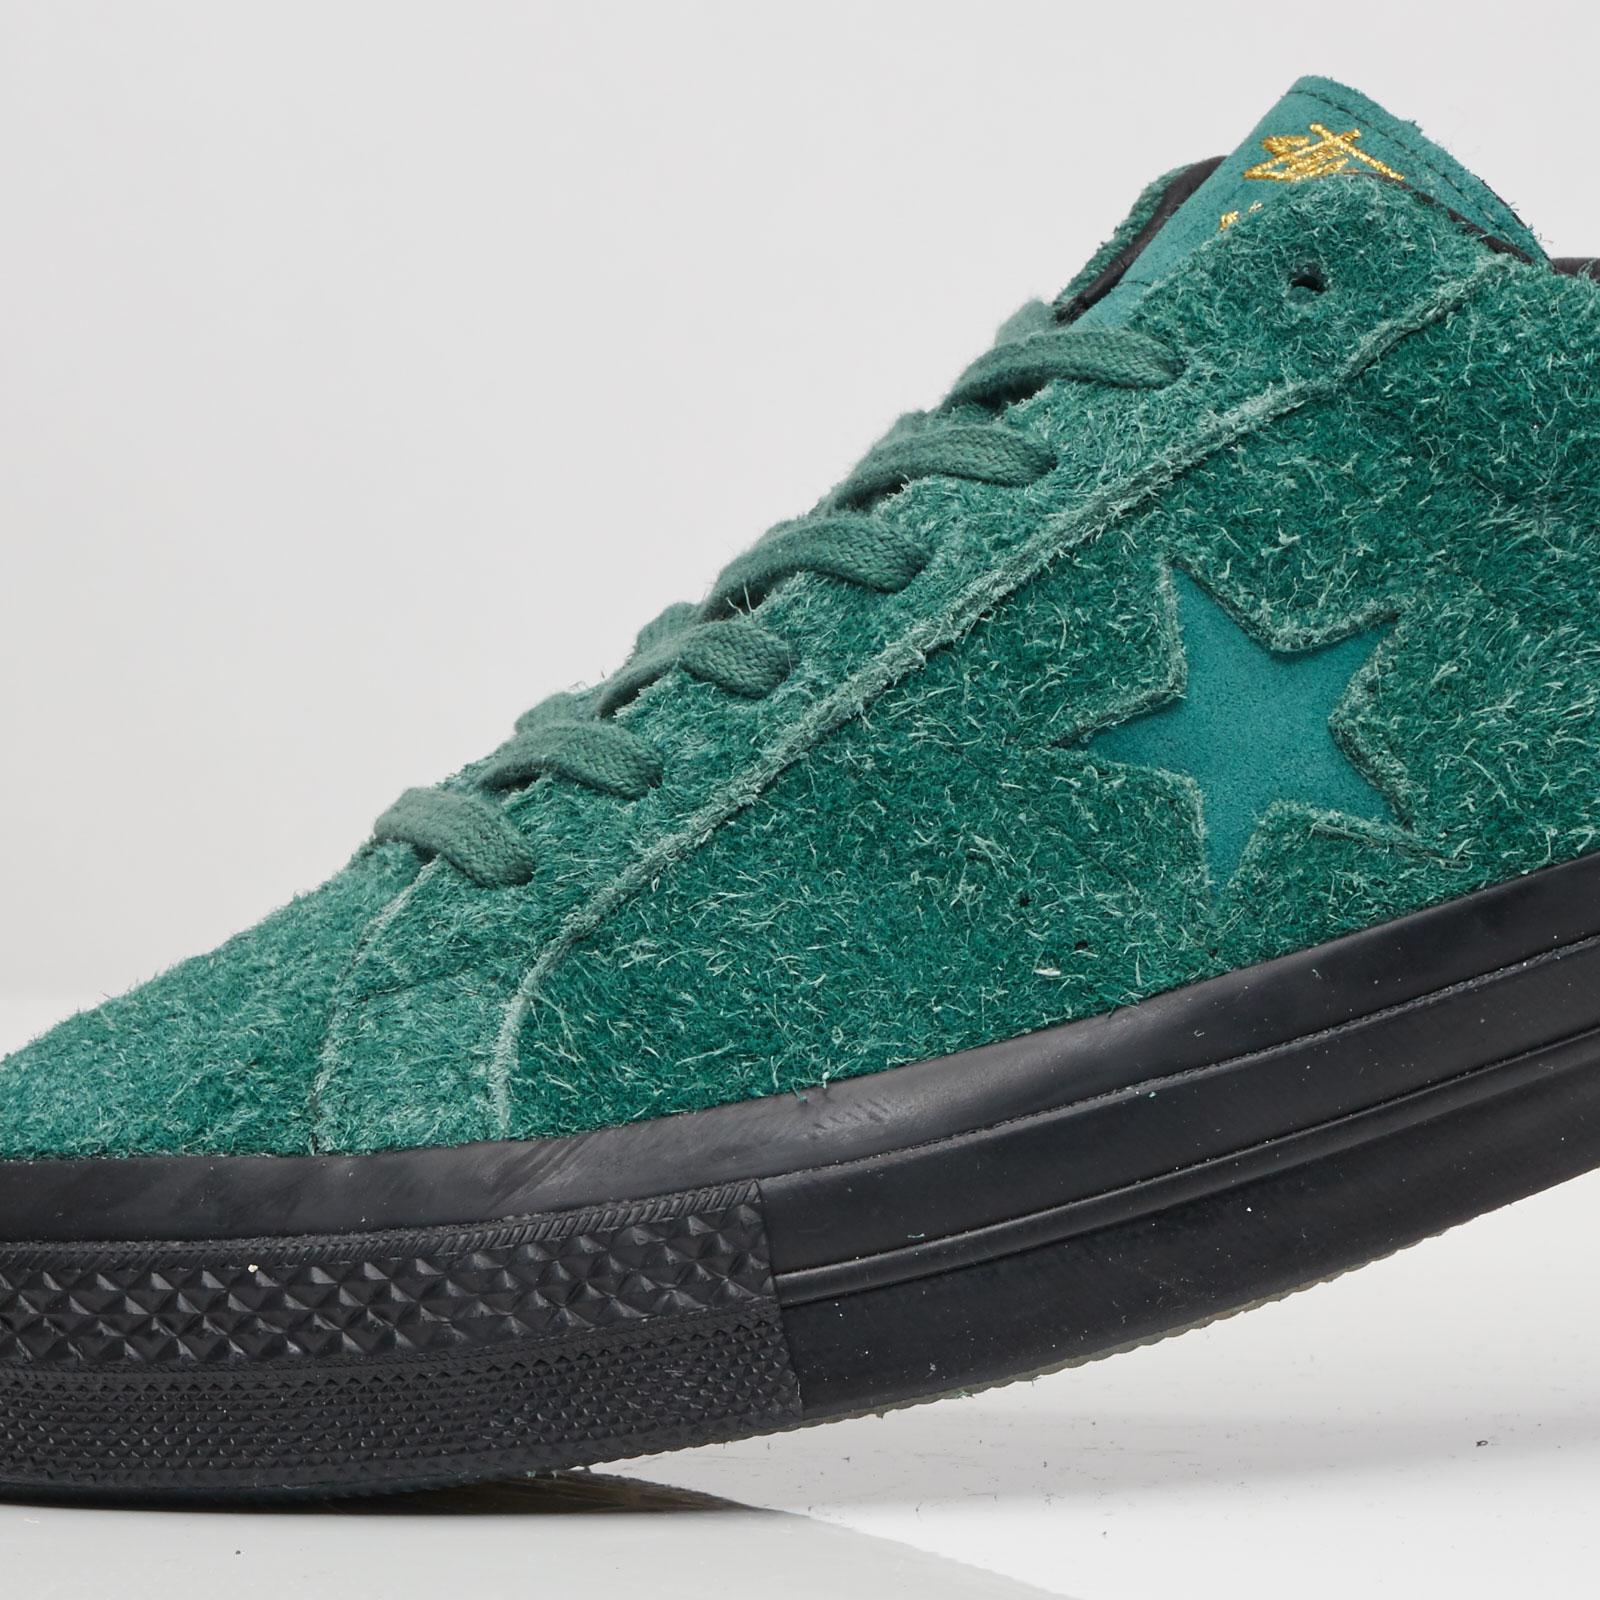 5fdba55fee56 Converse One Star 74 ox x Stüssy - 155341c - Sneakersnstuff ...